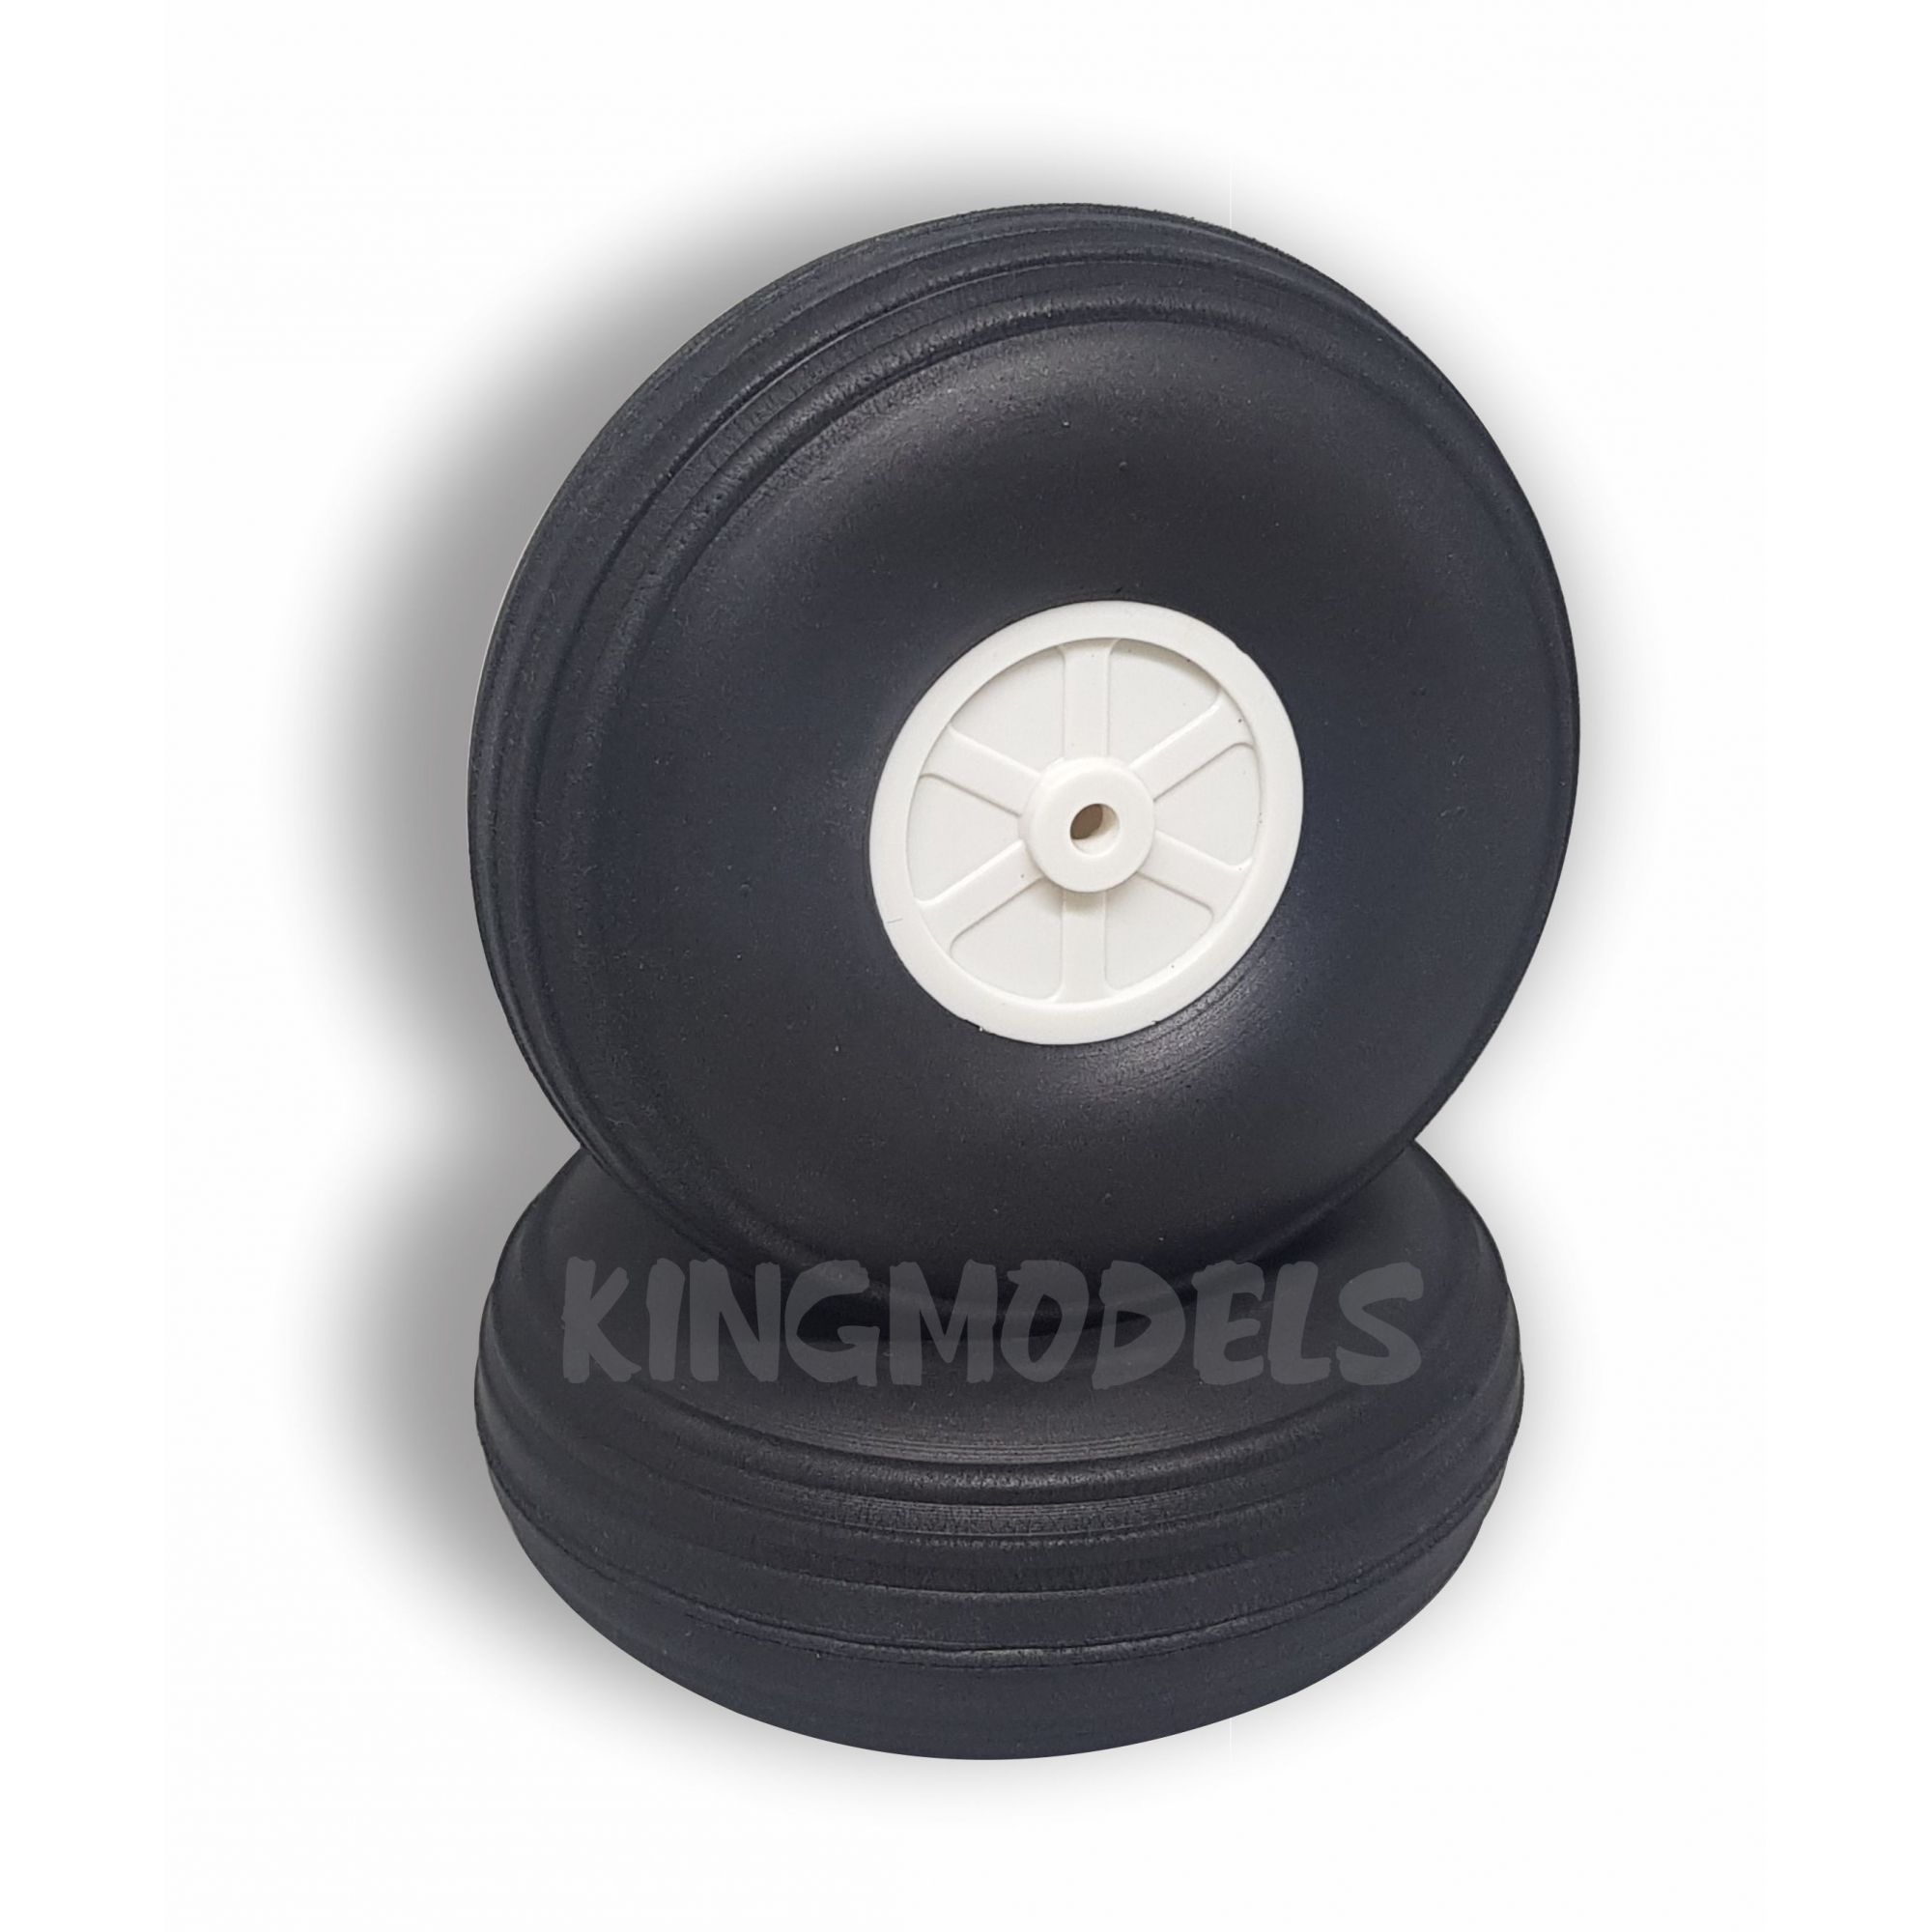 Roda De Borracha Extra-leve E Cubo Nylon- 51mm - (2pçs)   - King Models